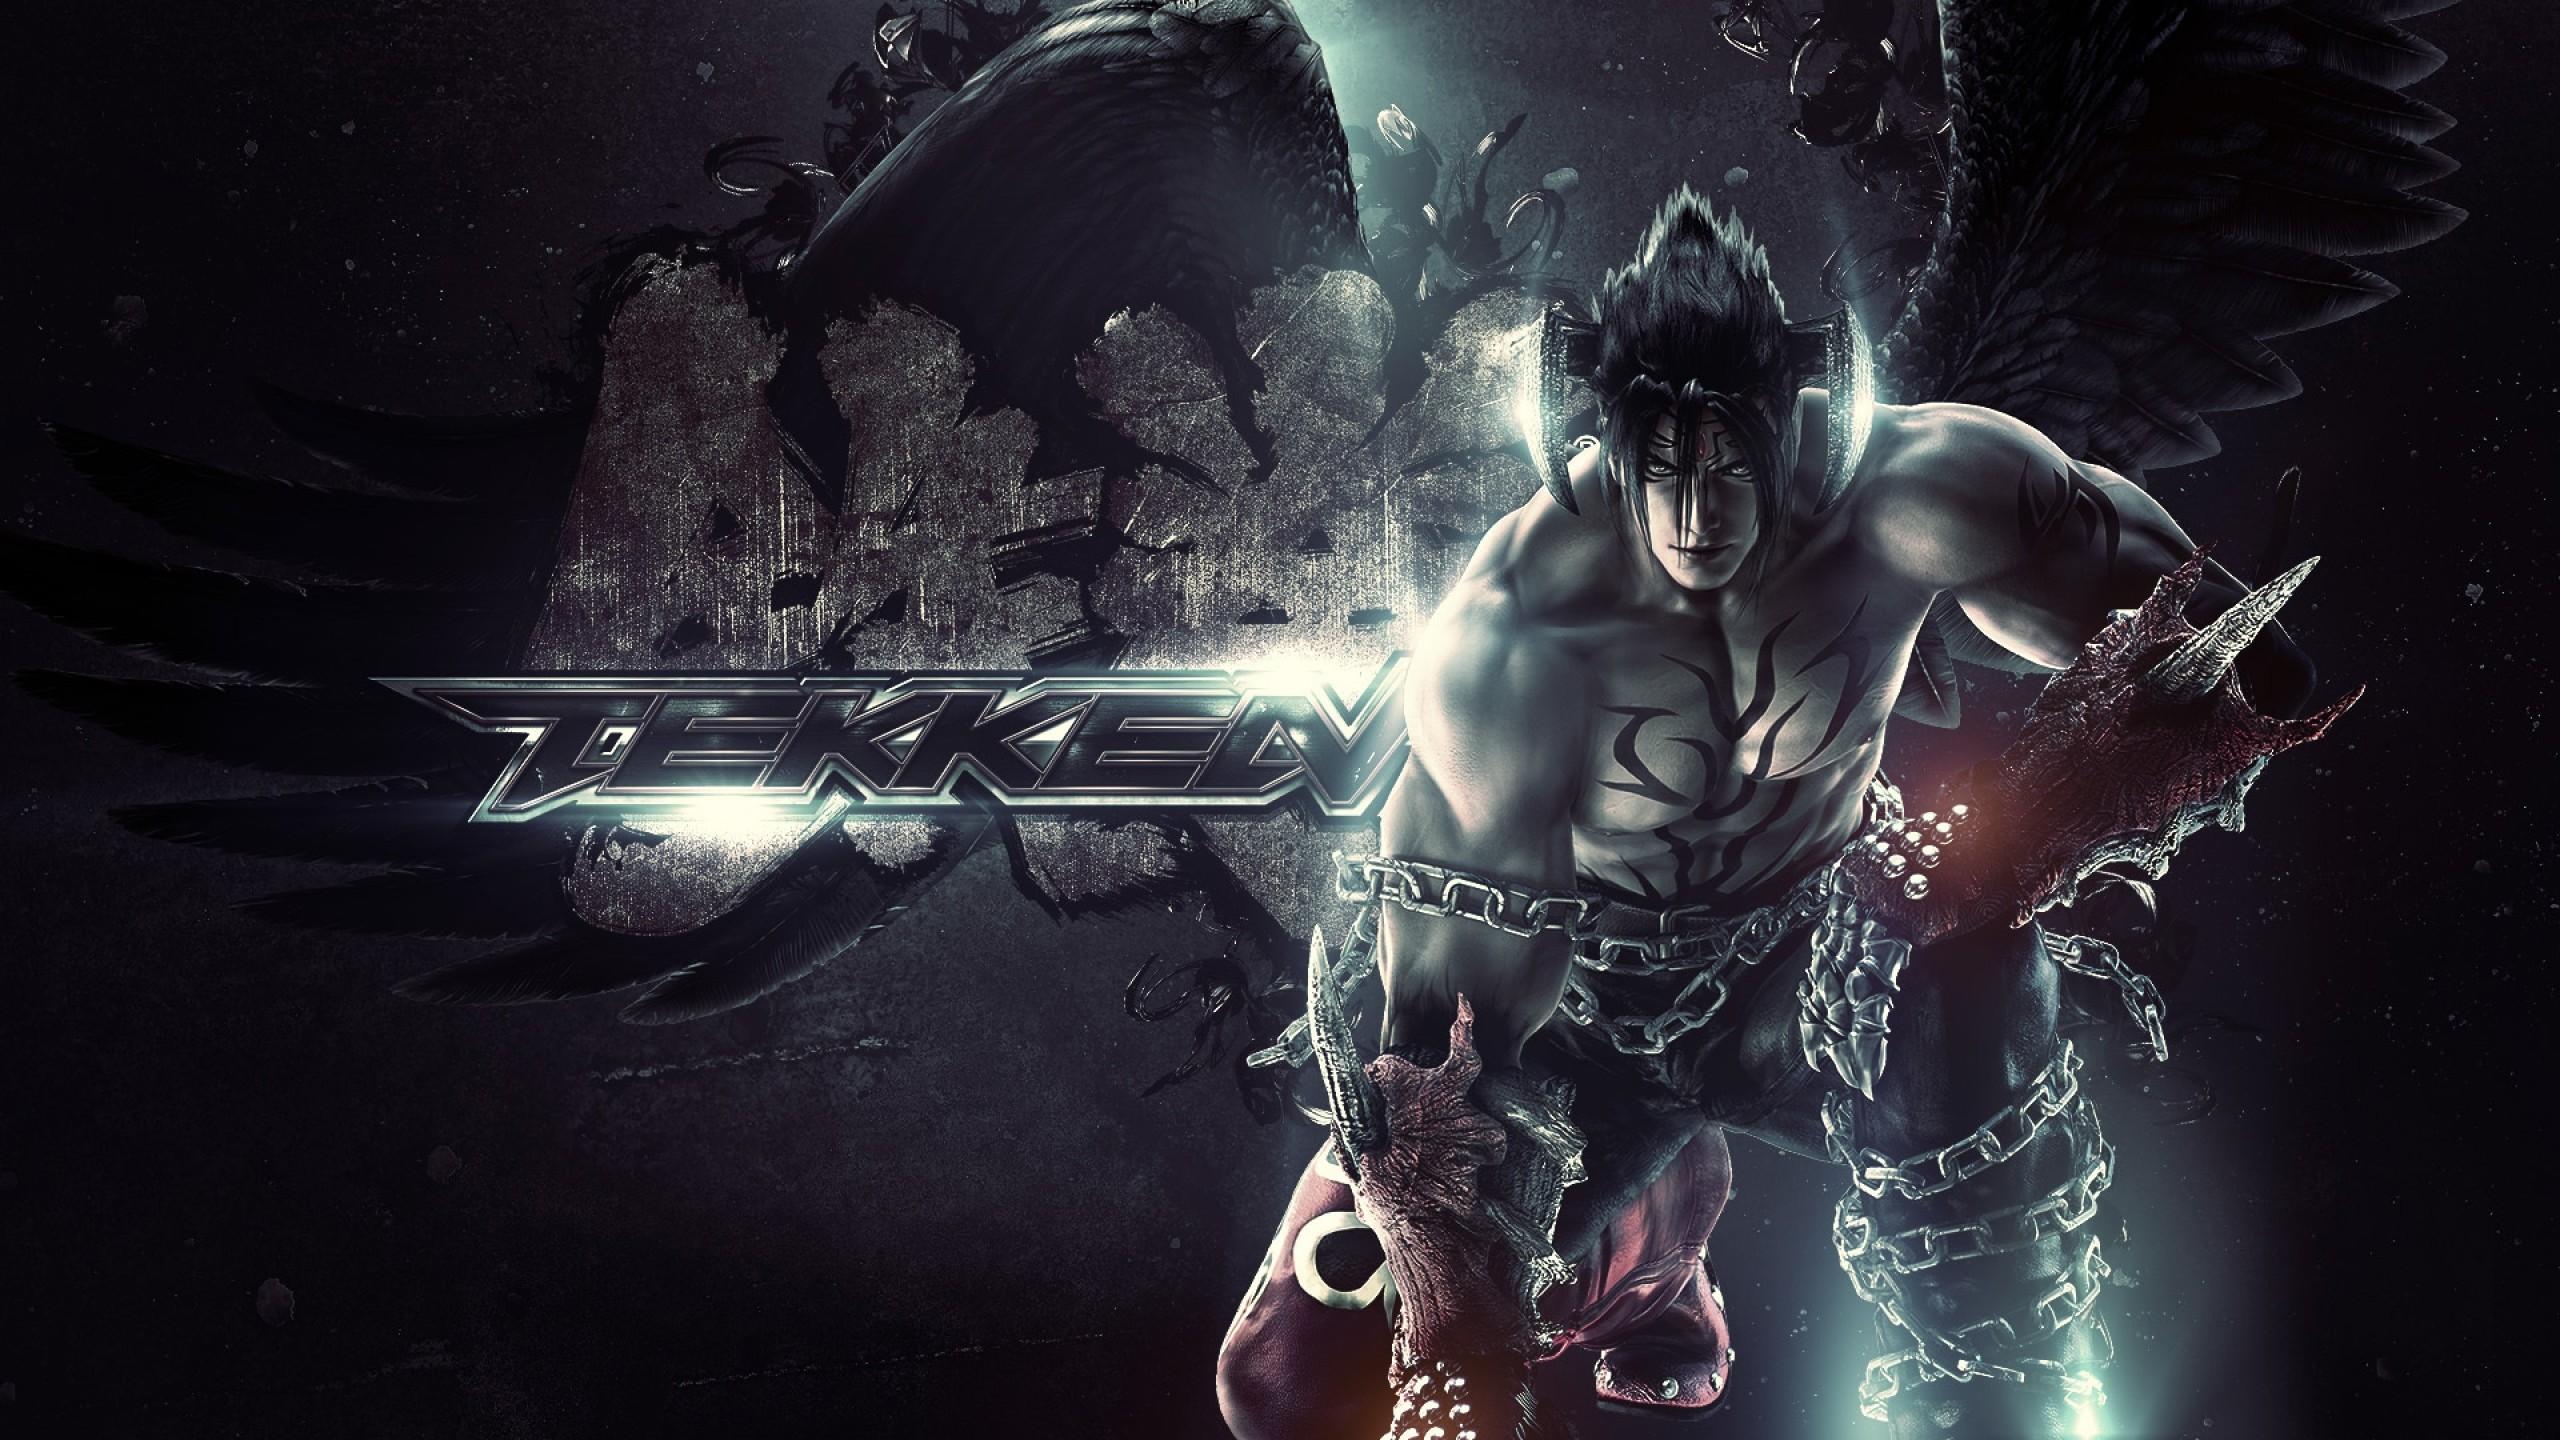 Wallpaper tekken, game, devil jin, fighting, fighter, video game